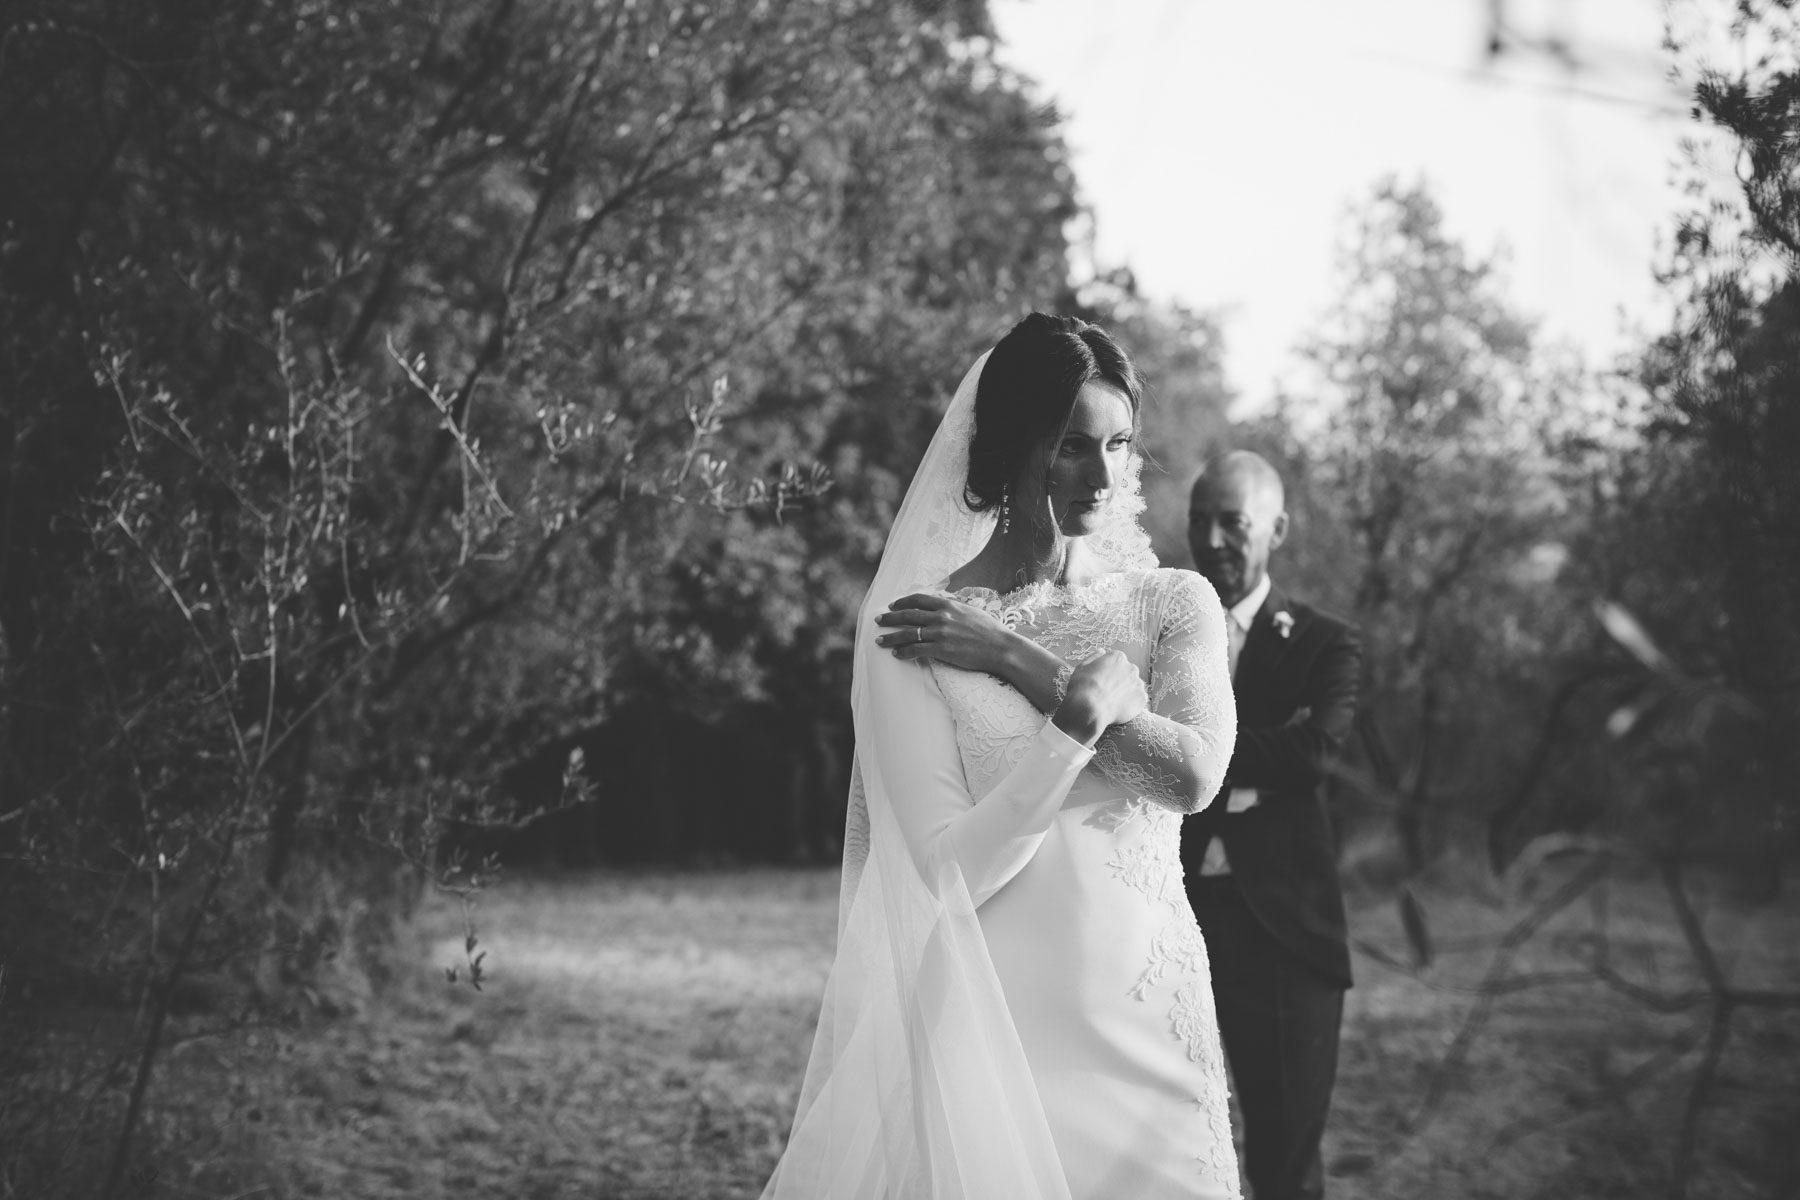 Matrimonio Toscana Prezzi : Fotografo matrimonio pistoia e